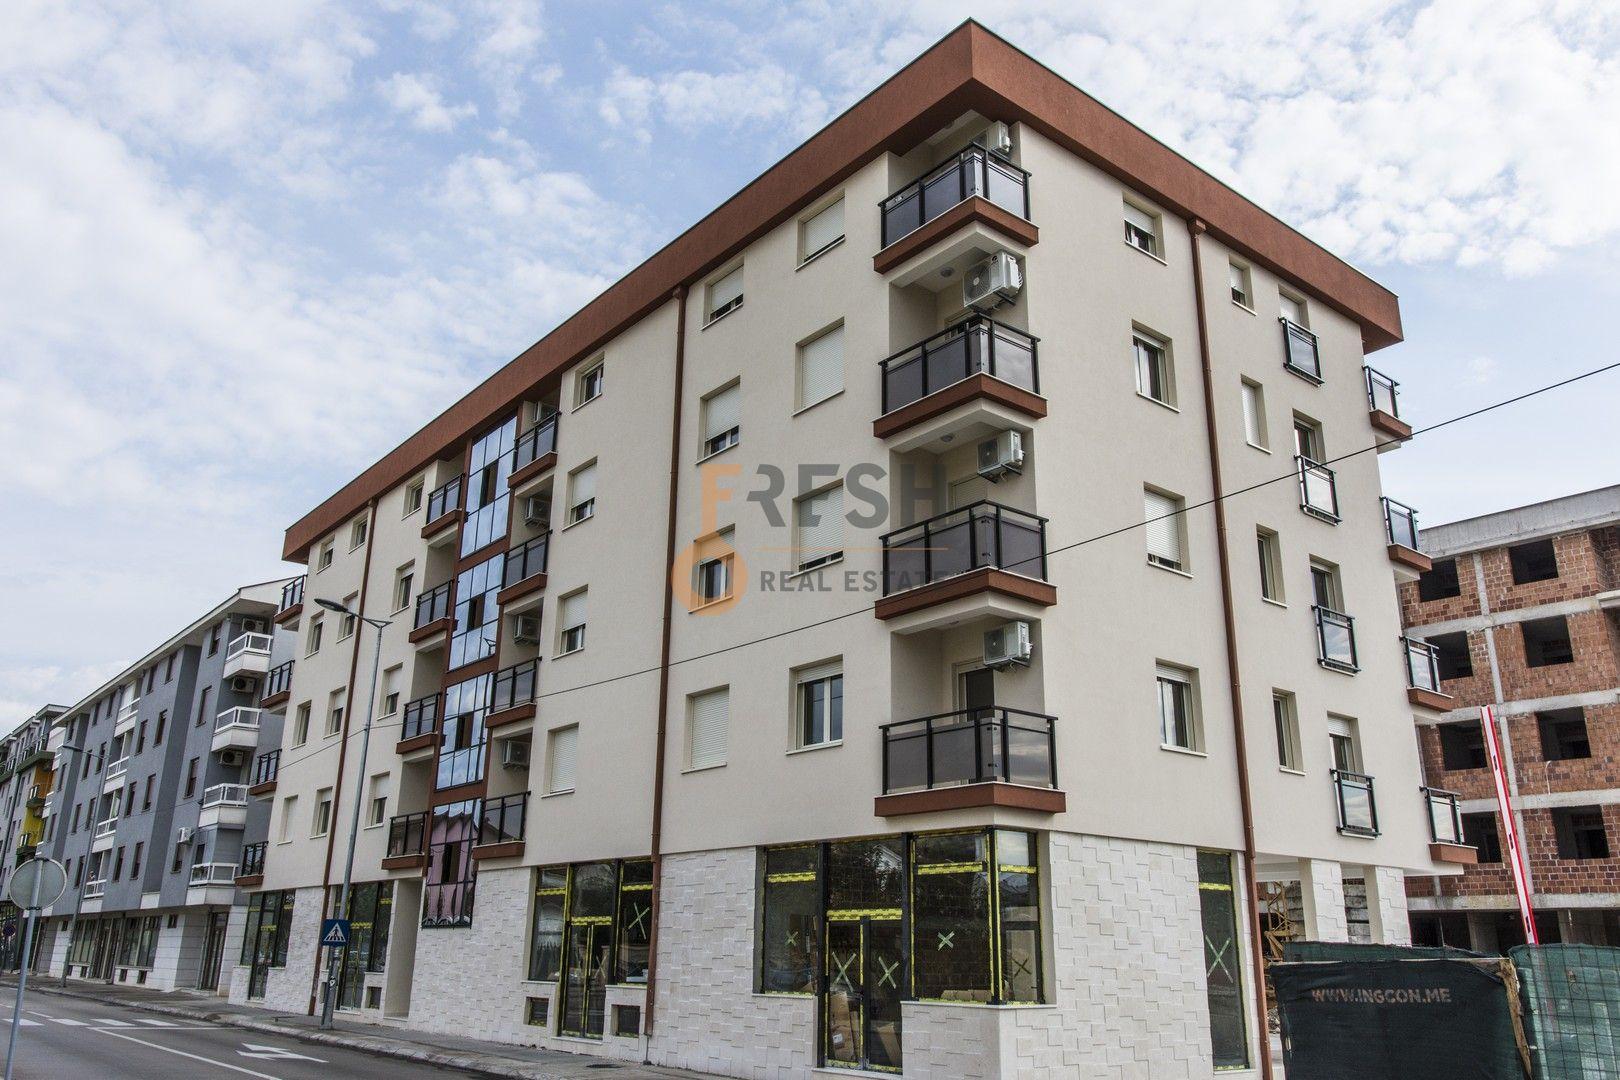 Poslovni prostor, 140m2, Dalmatinska ulica, Nova zgrada, Prodaja - 1